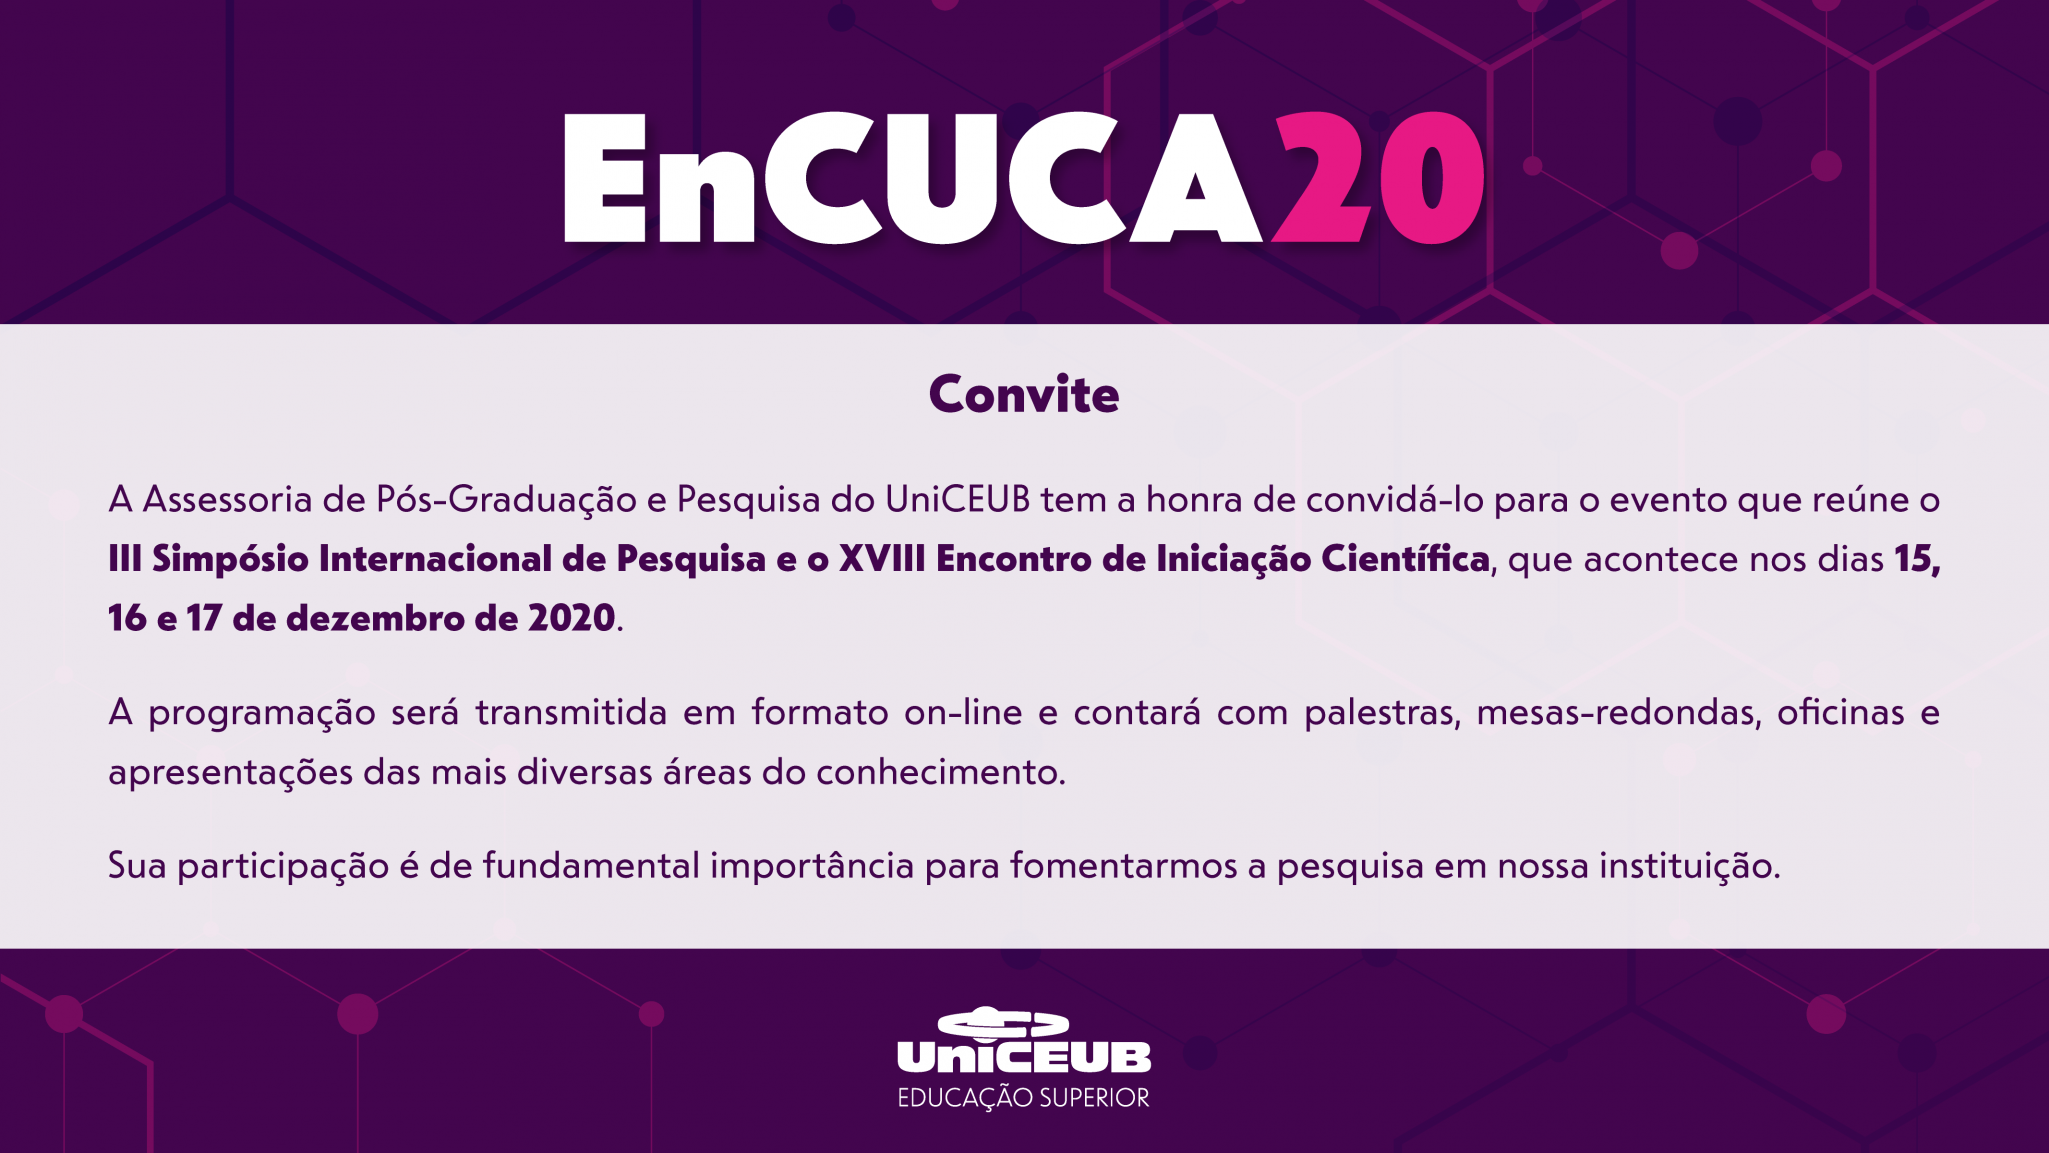 encuca20